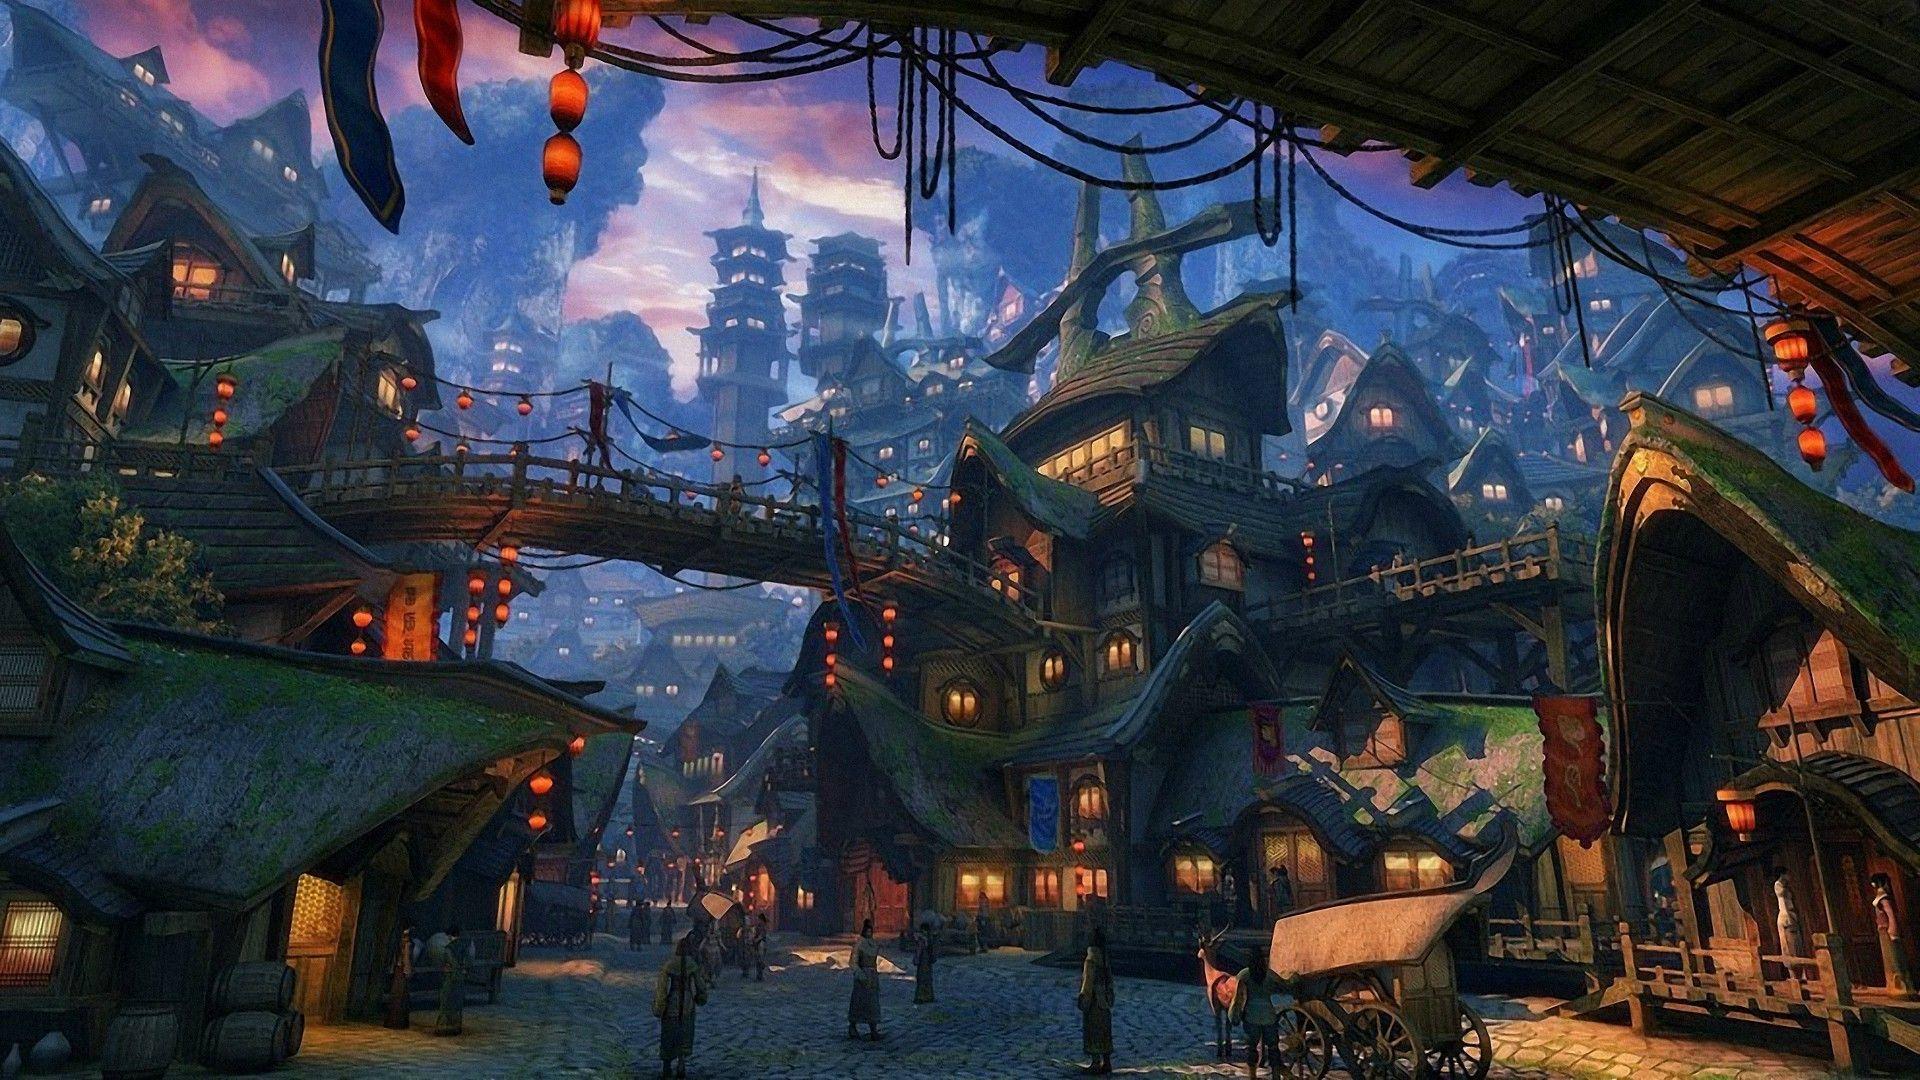 ancient china town anime Google Search 1080p, Cenario